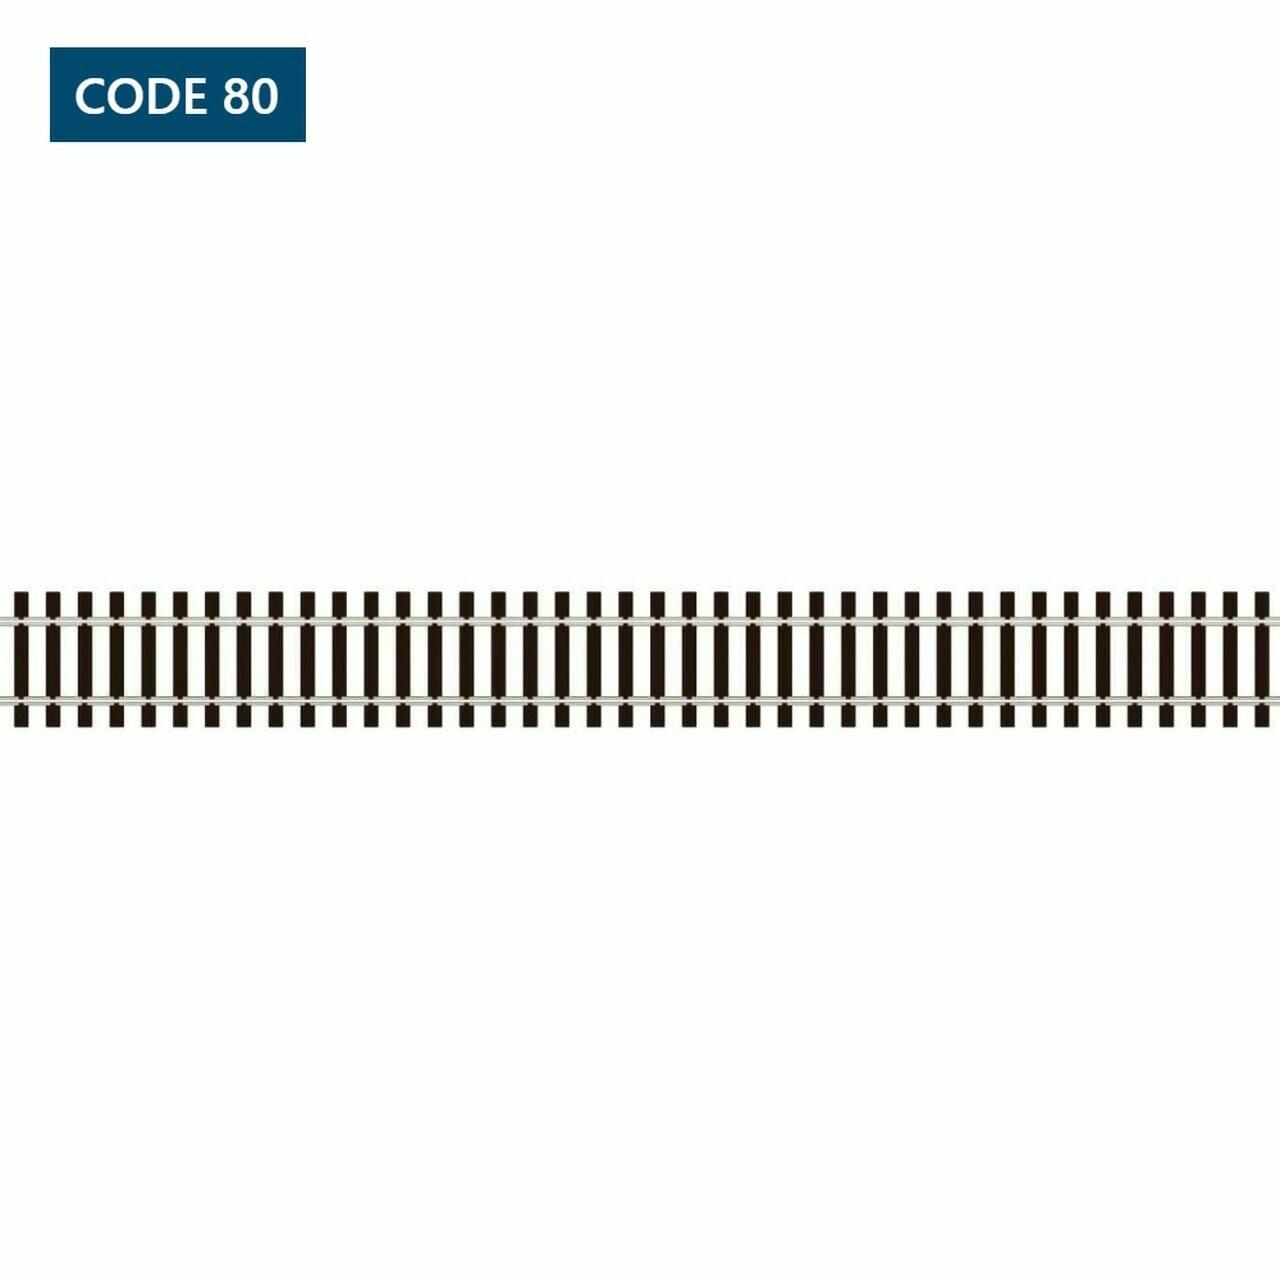 N Scale Code 80 Flex Track - Wooden Sleepers